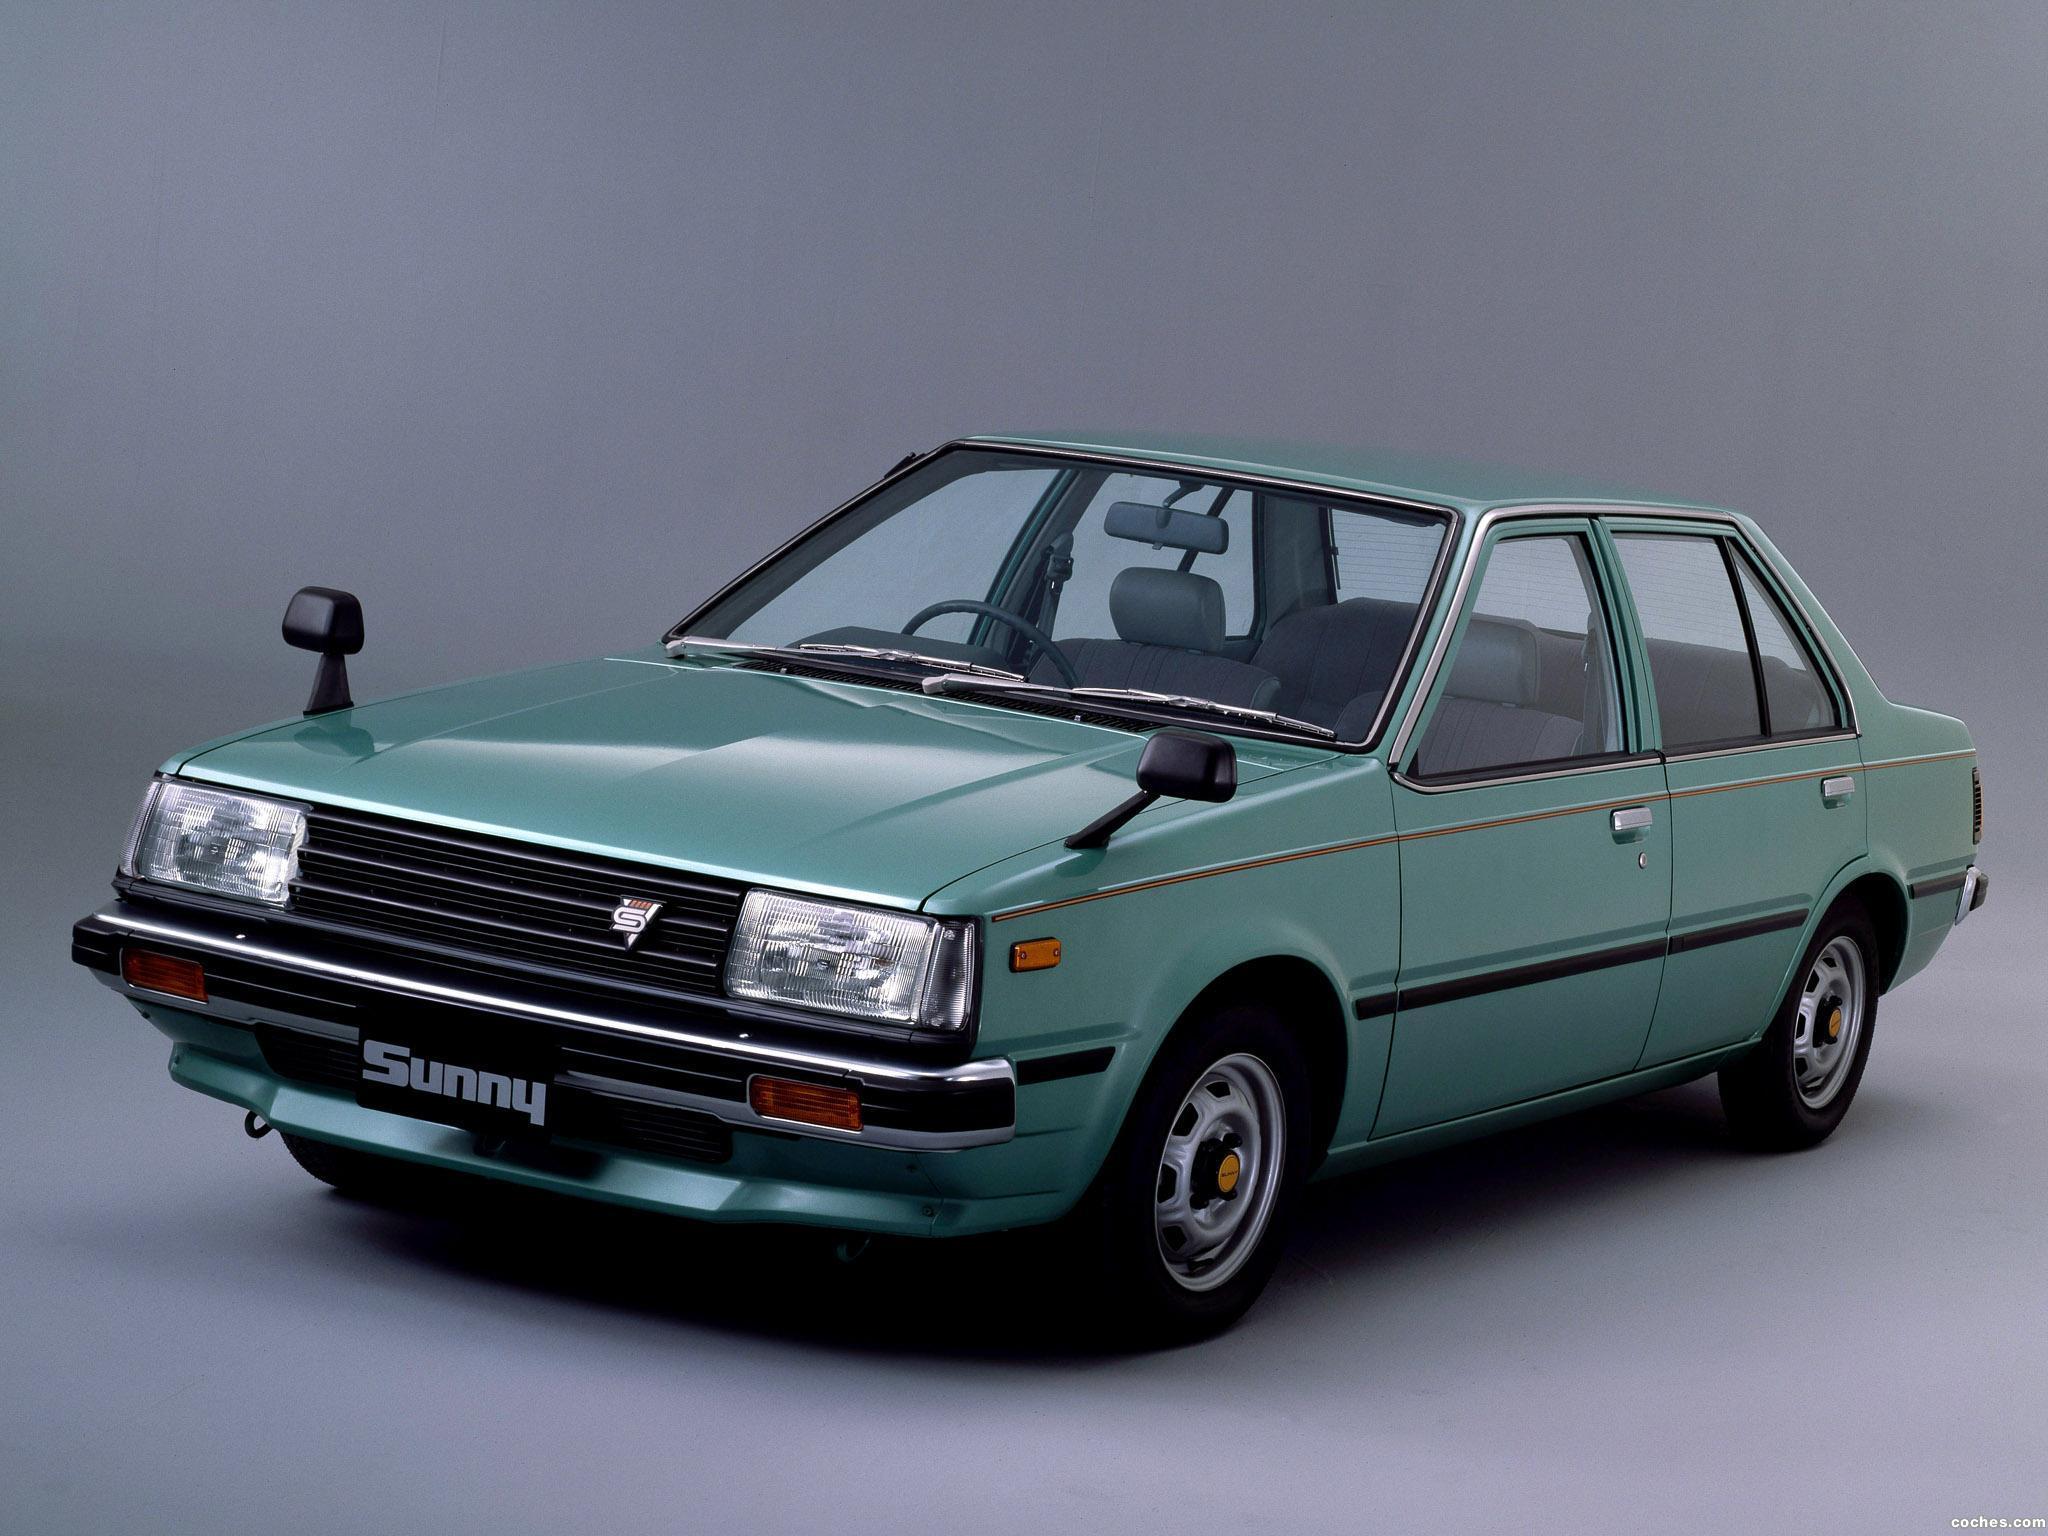 Foto 0 de Nissan Sunny Sedan 1.7 GLD B11 1981